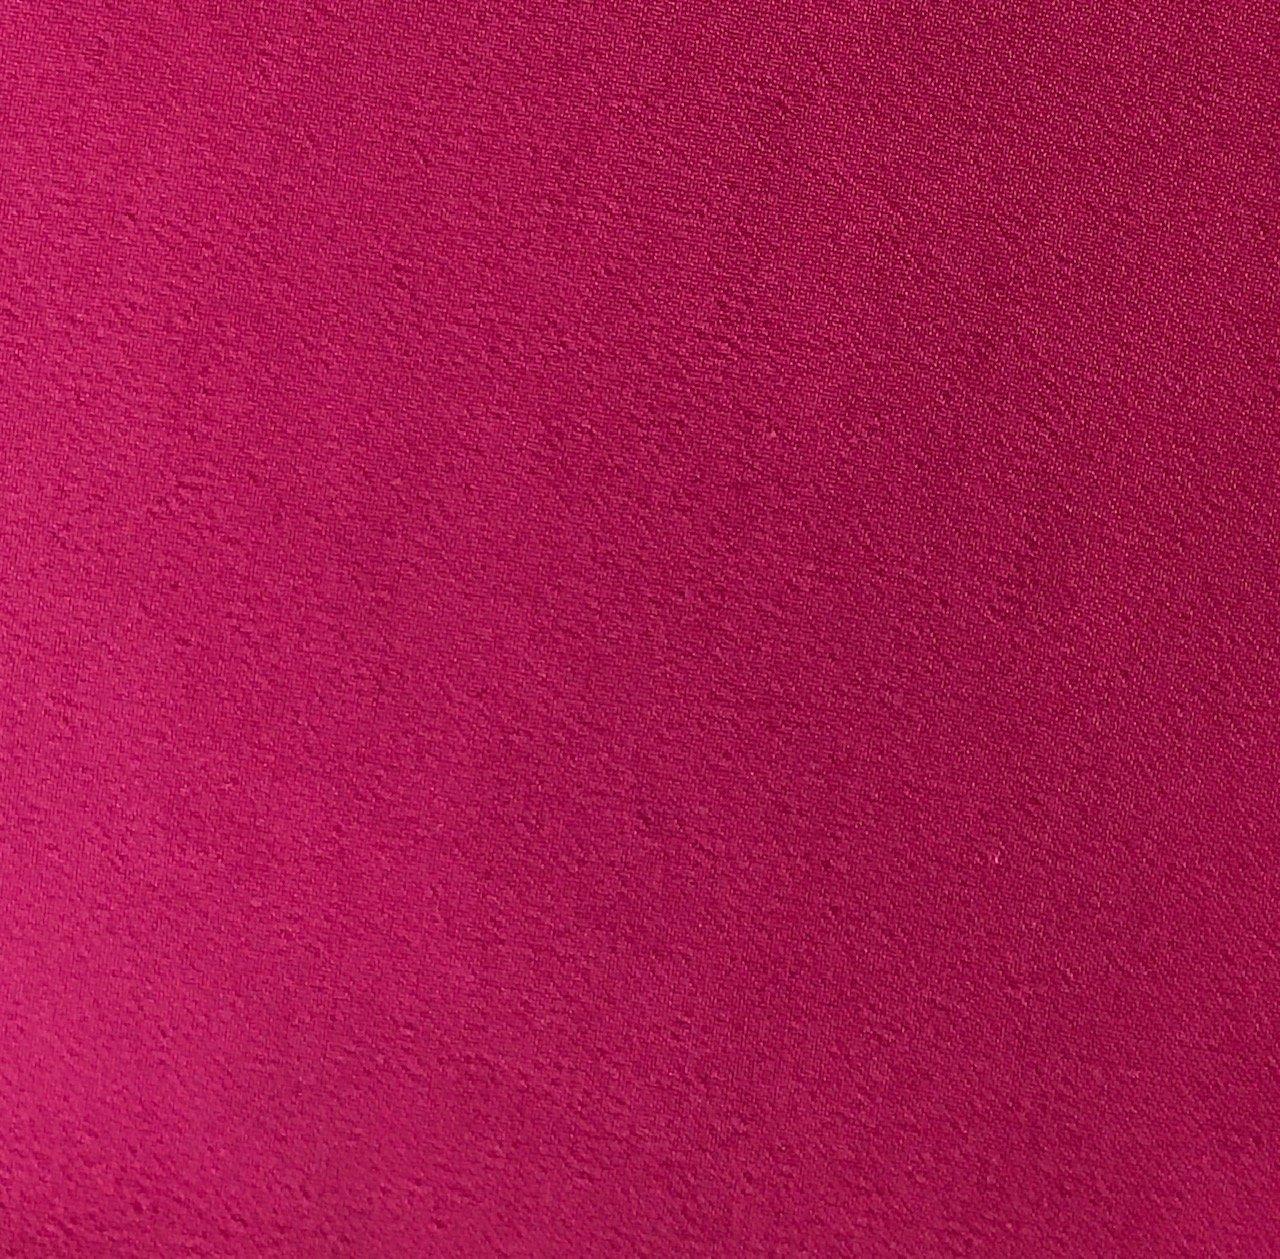 Silk weight Microfiber - Fuchsia